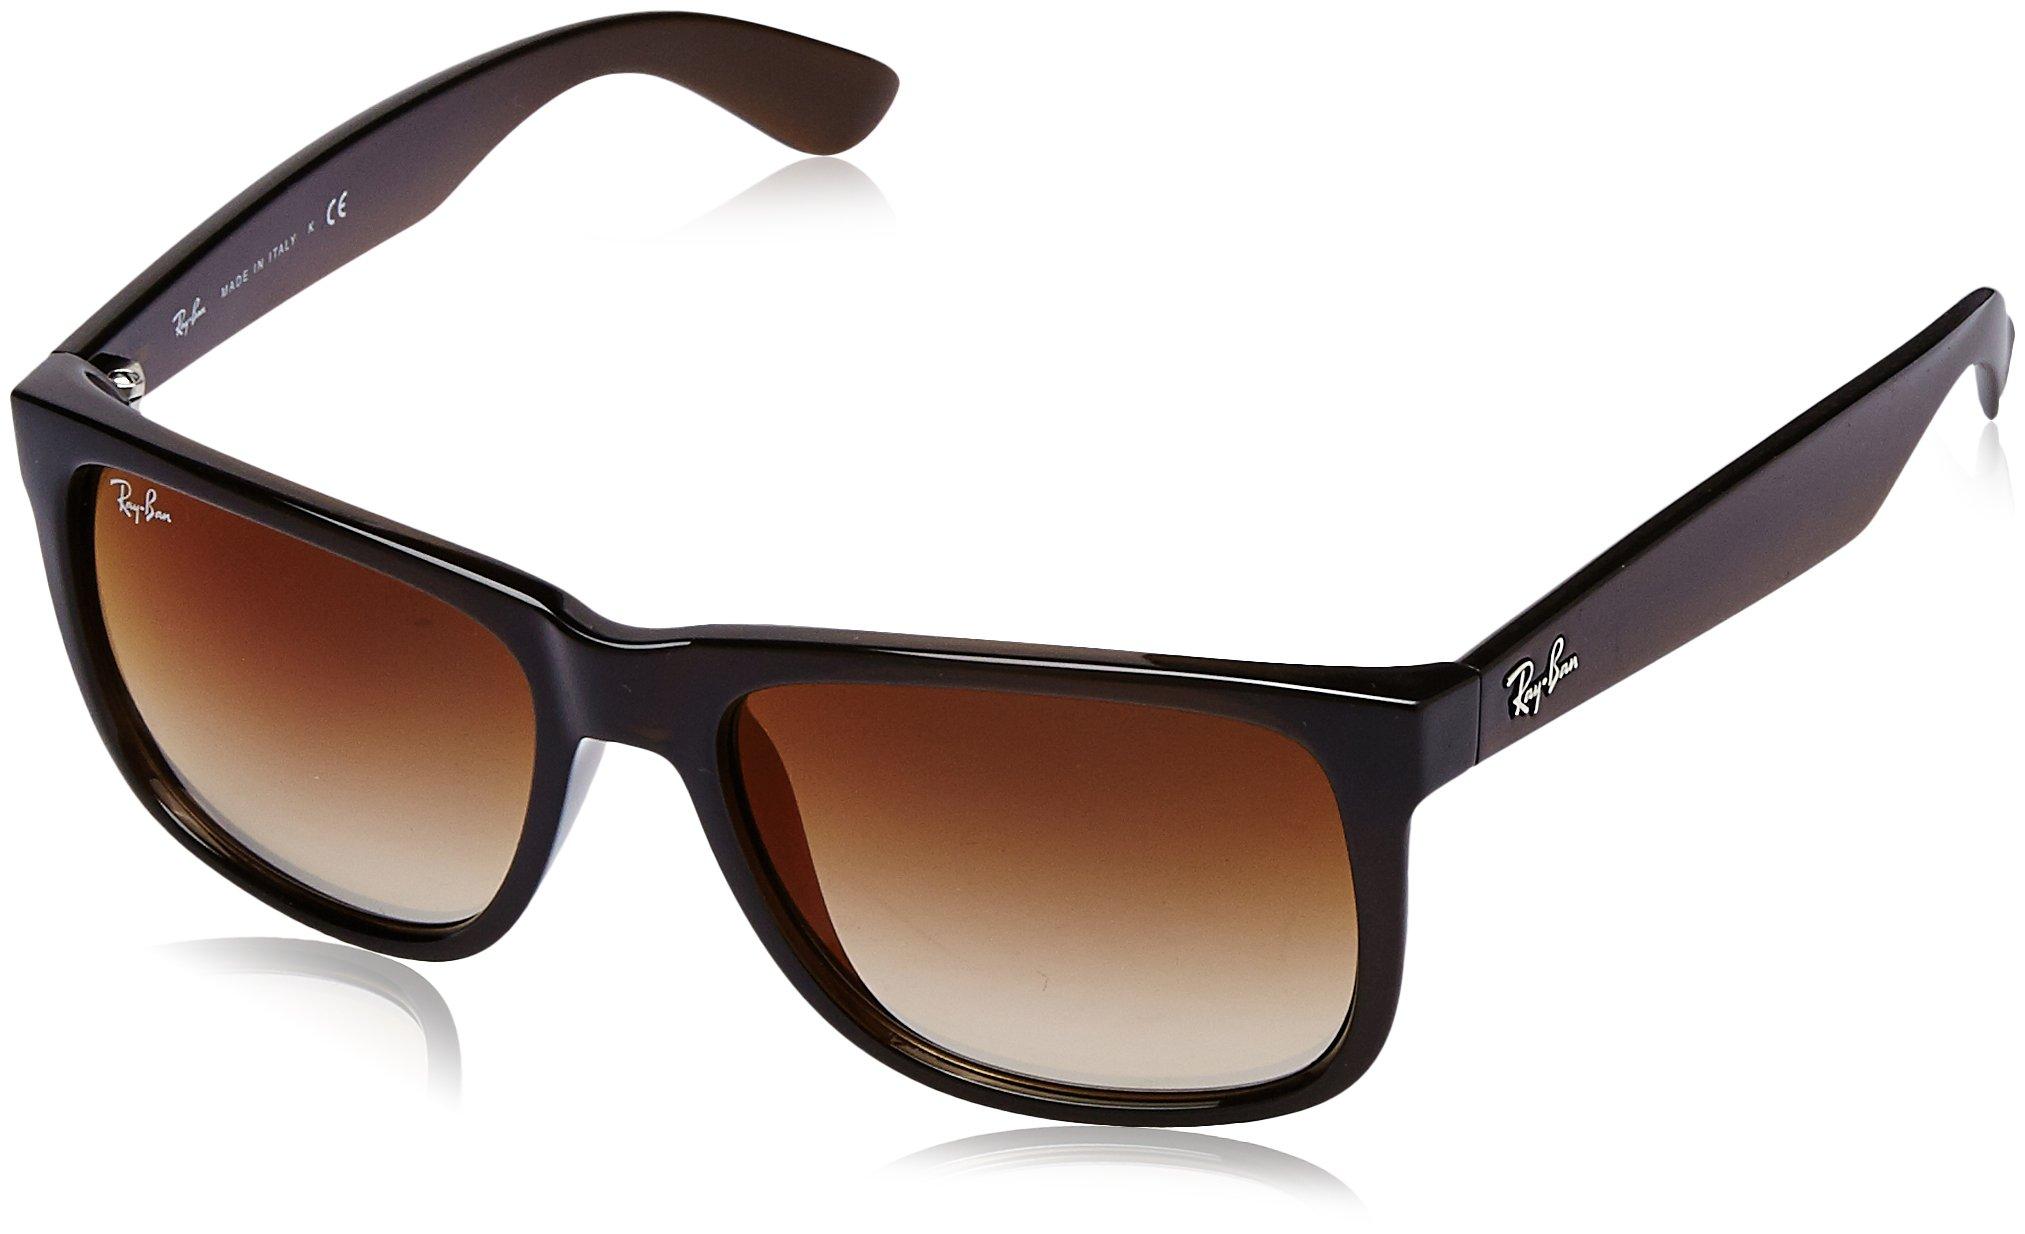 Ray-Ban Nylon Men Non-Polarized Iridium Rectangular Sunglasses, Brown, 53 mm